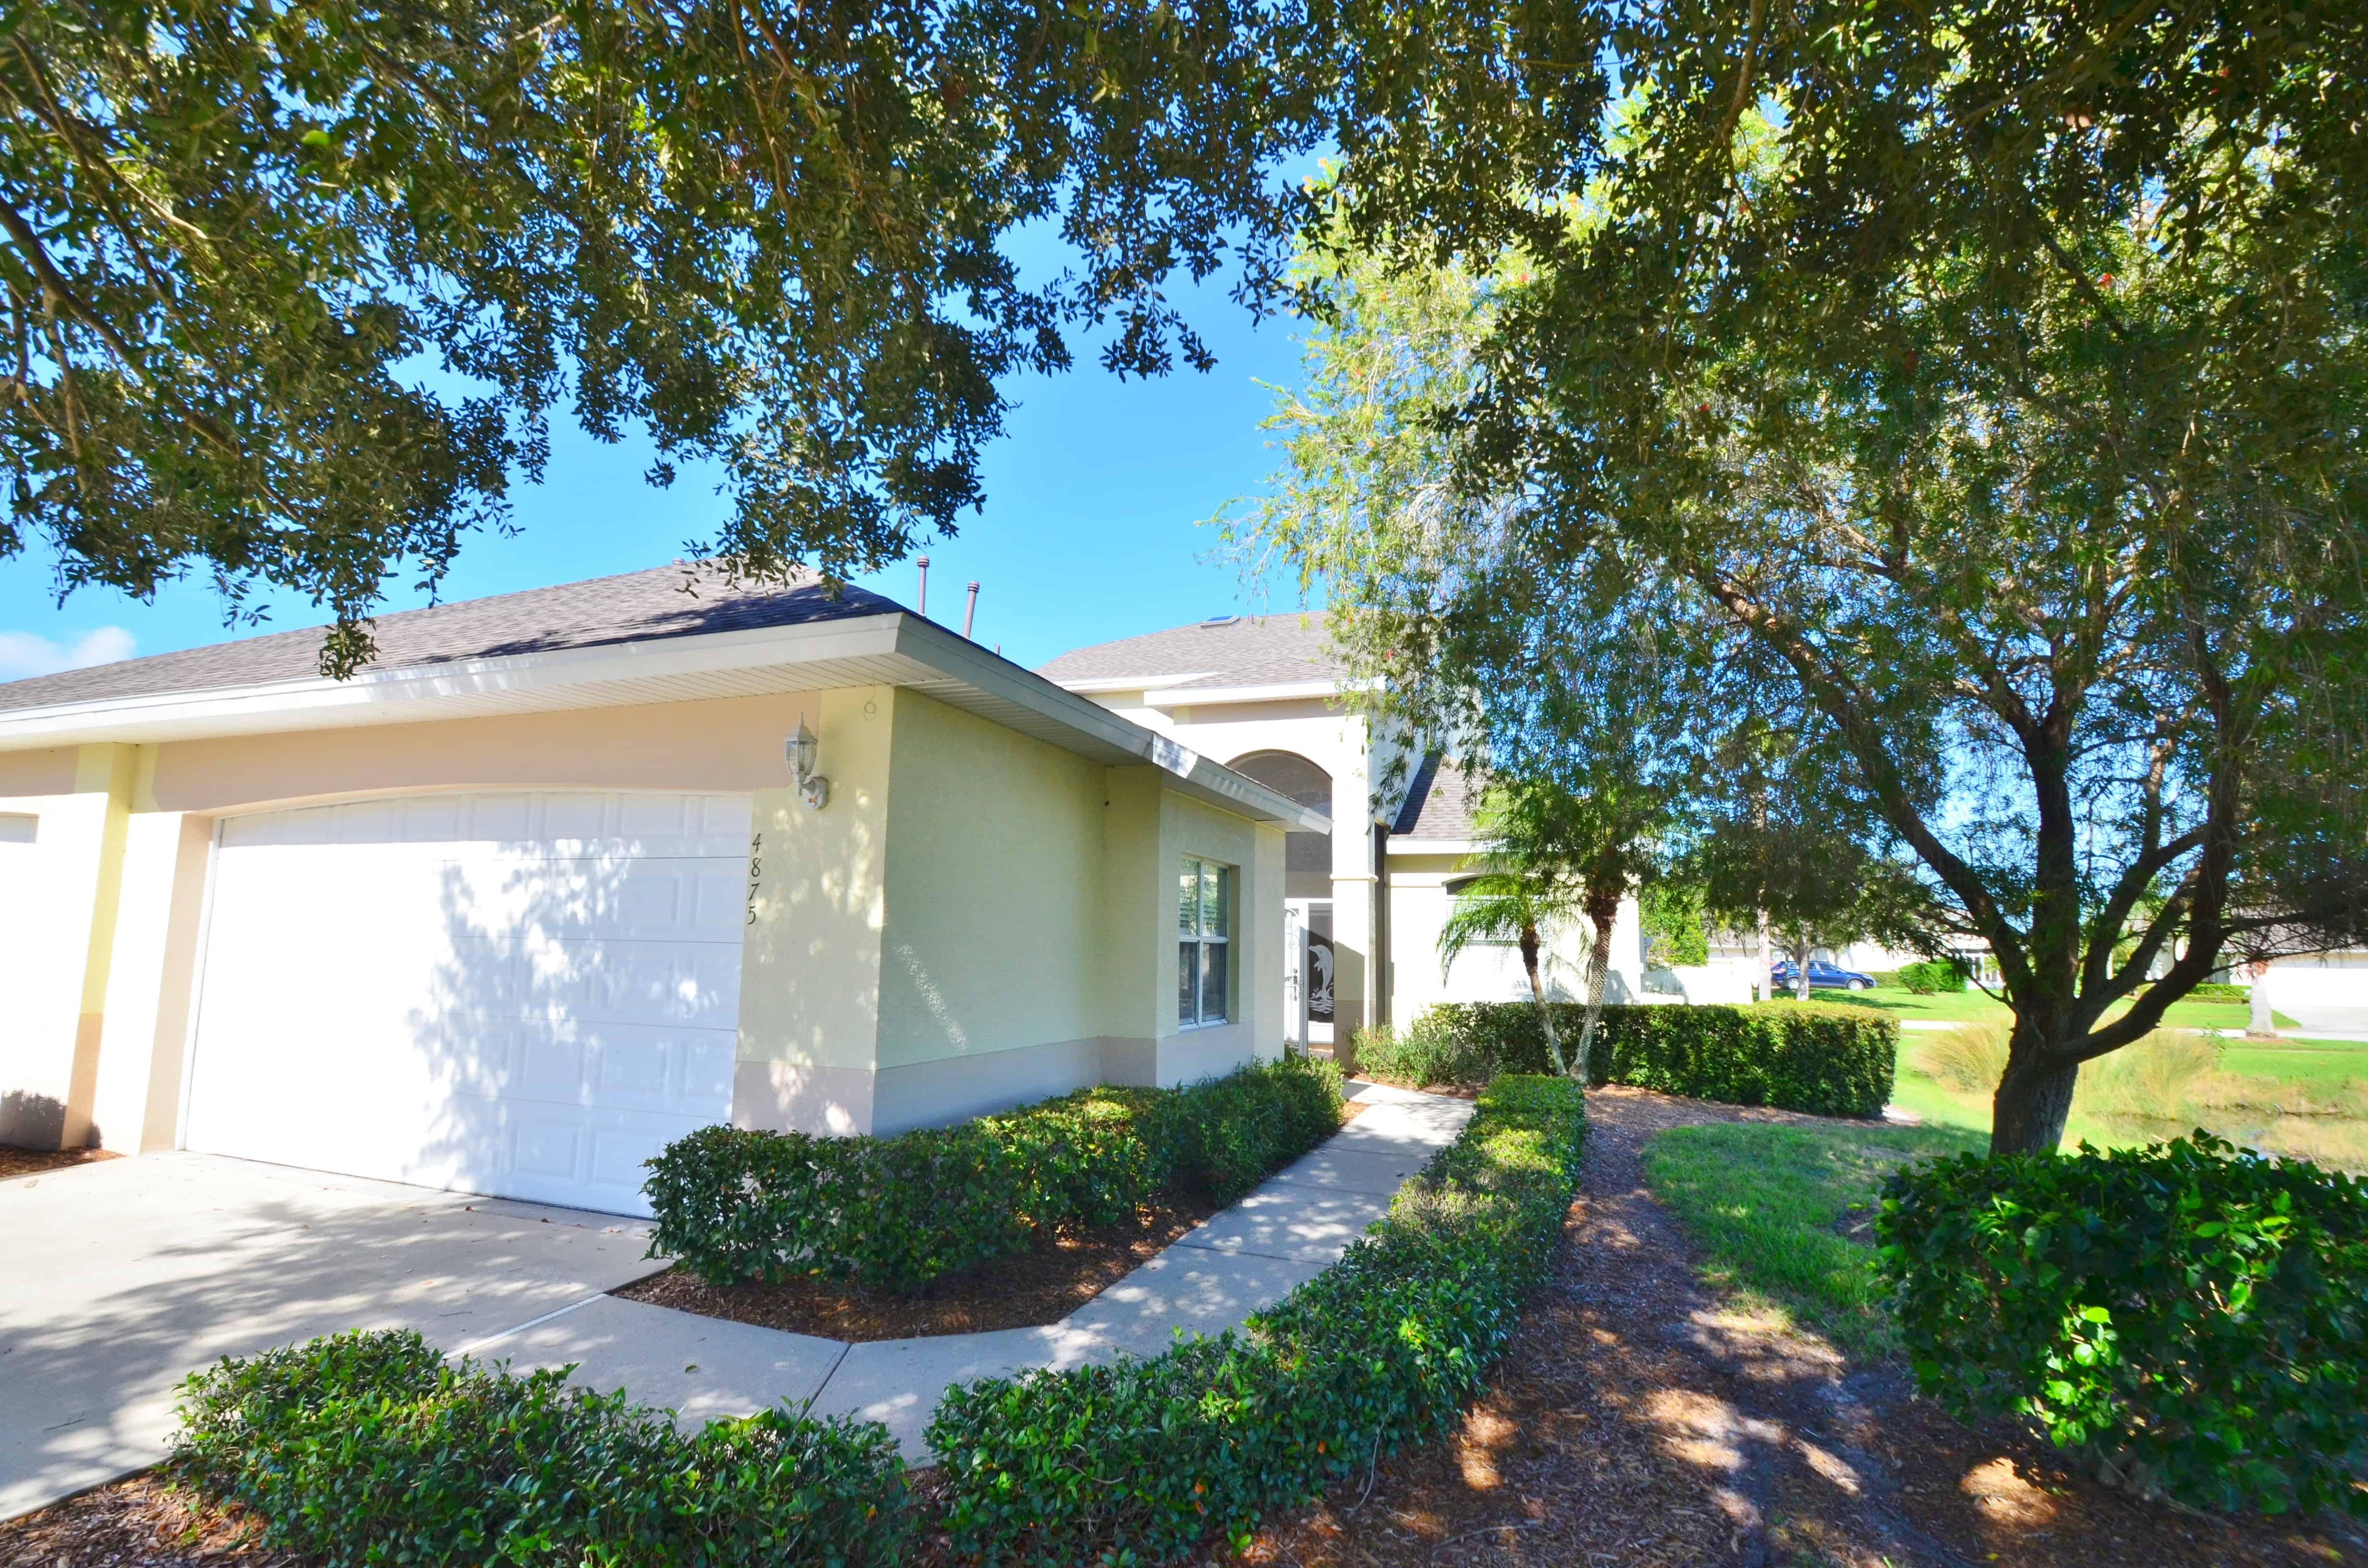 SOLD – 4875 Bren Cout, Rockledge, FL 32955 – $200,000